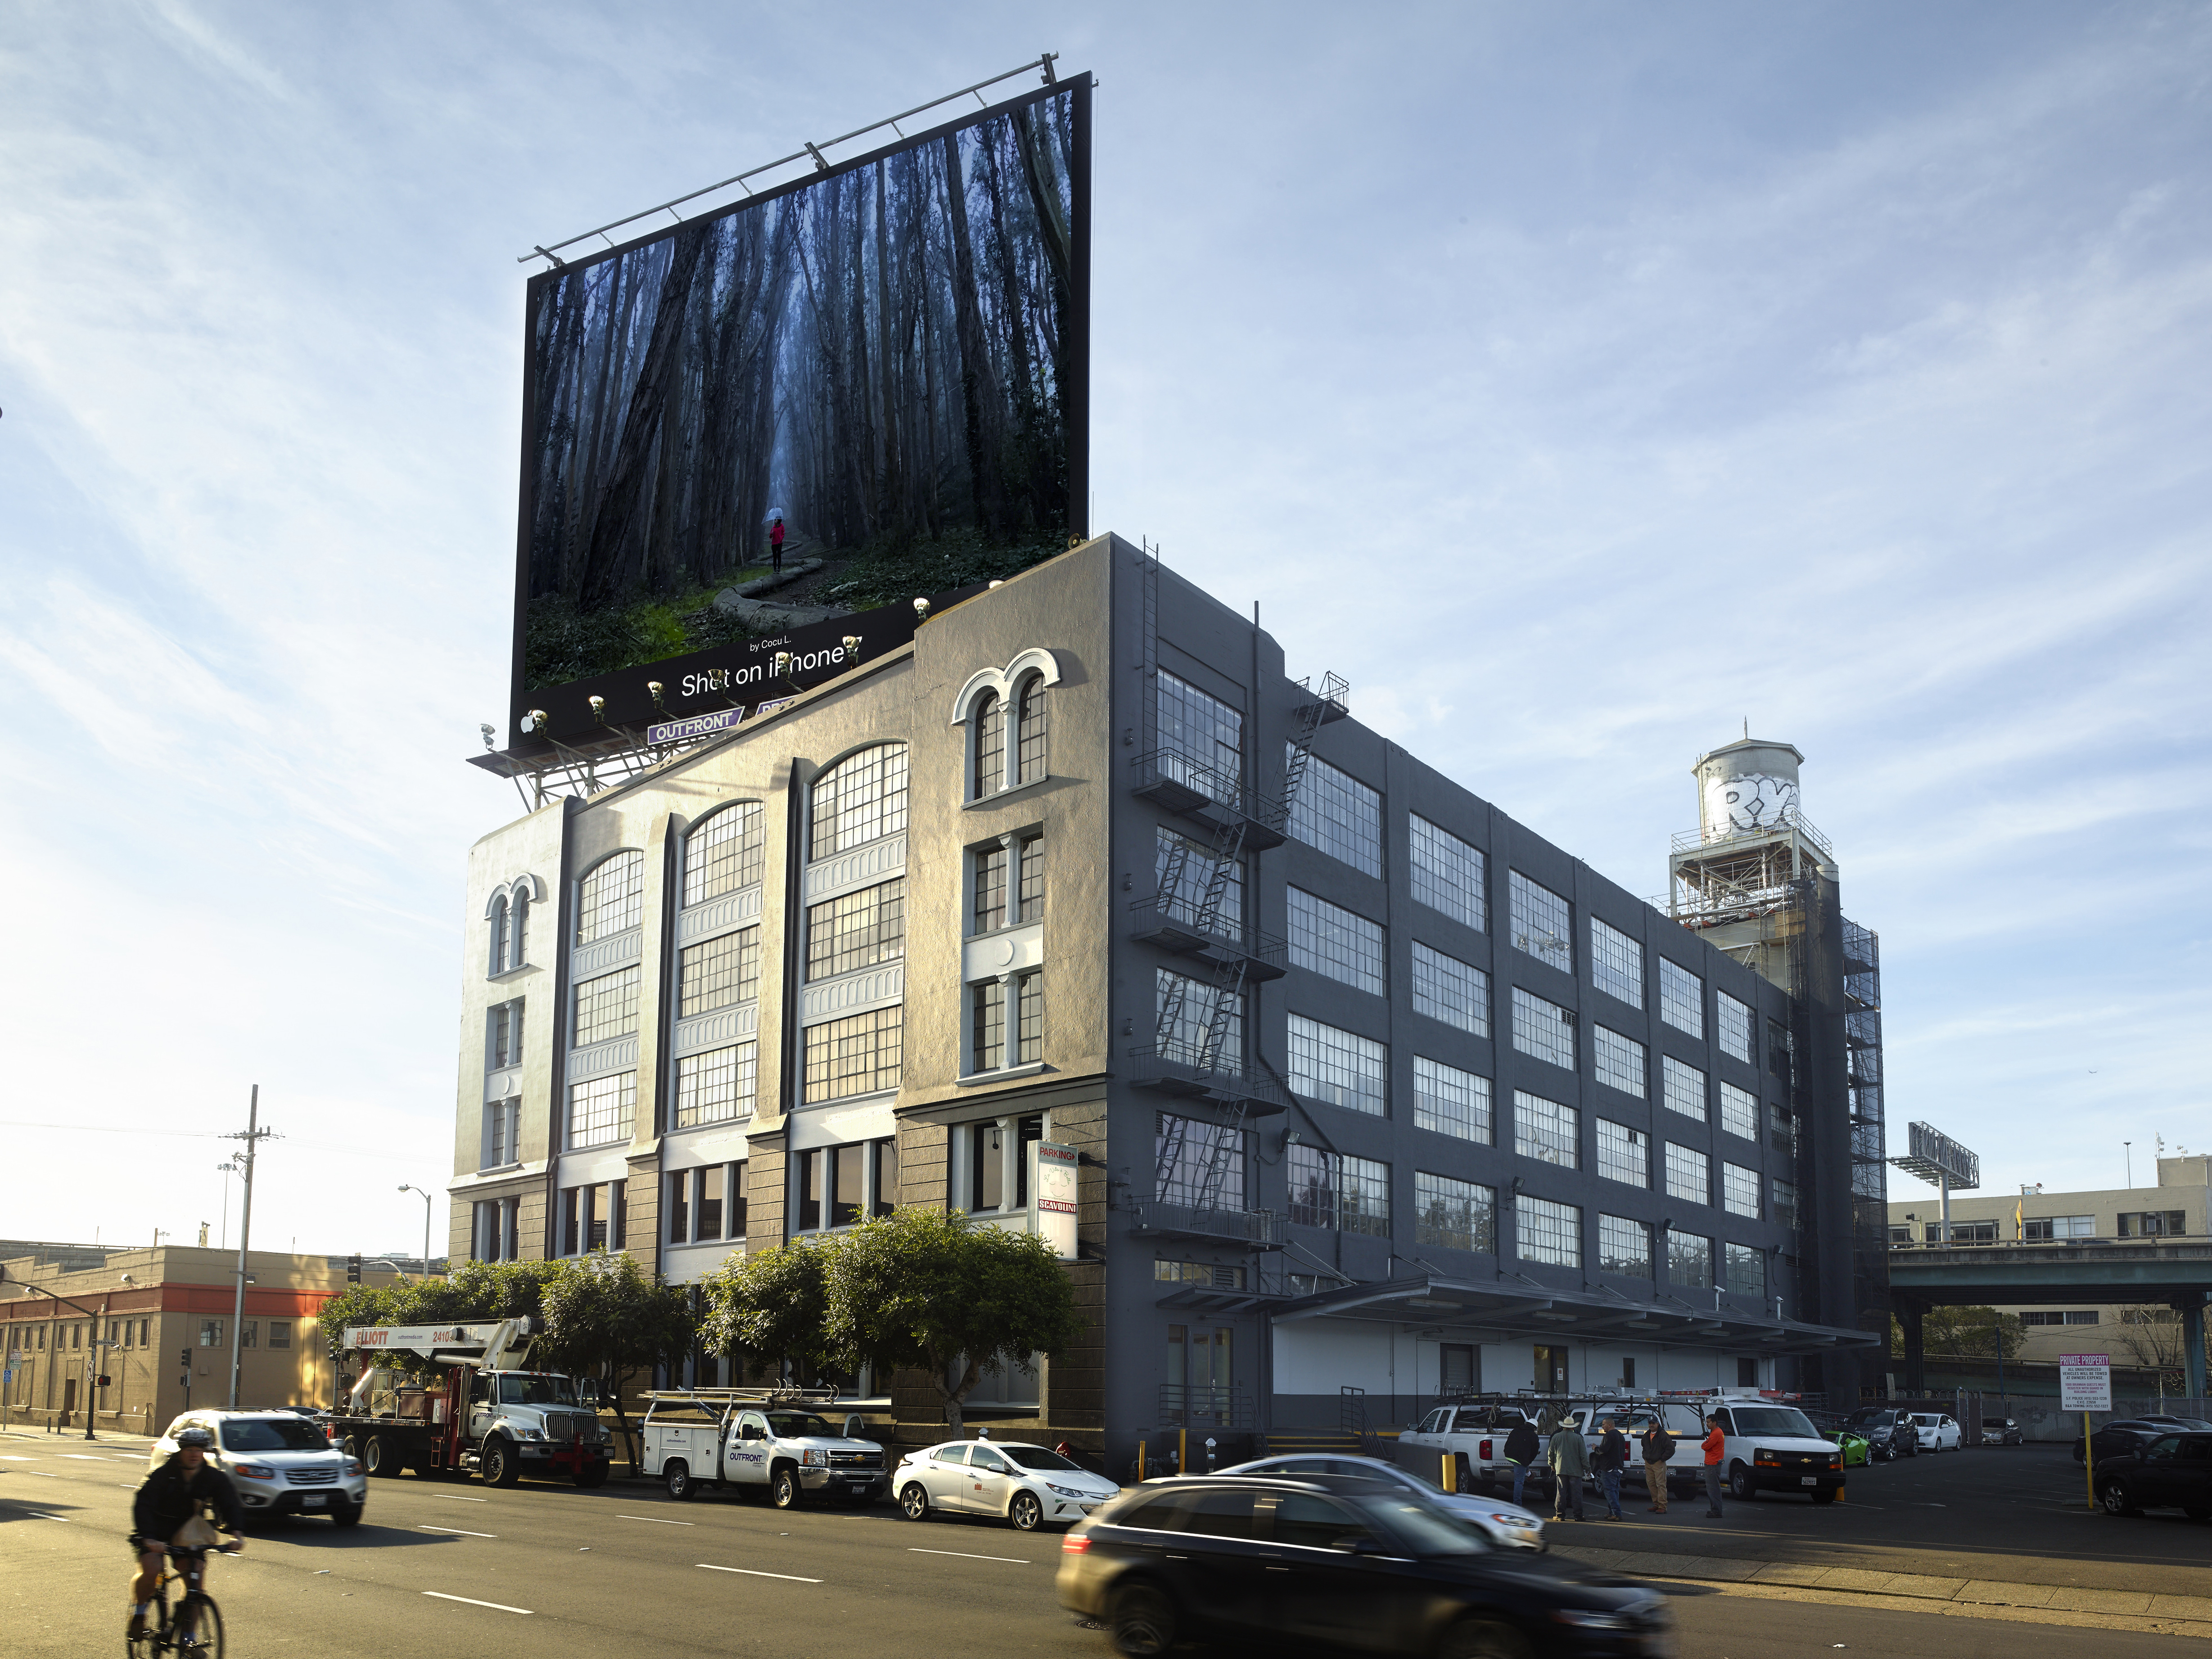 Apple billboard in San Francisco